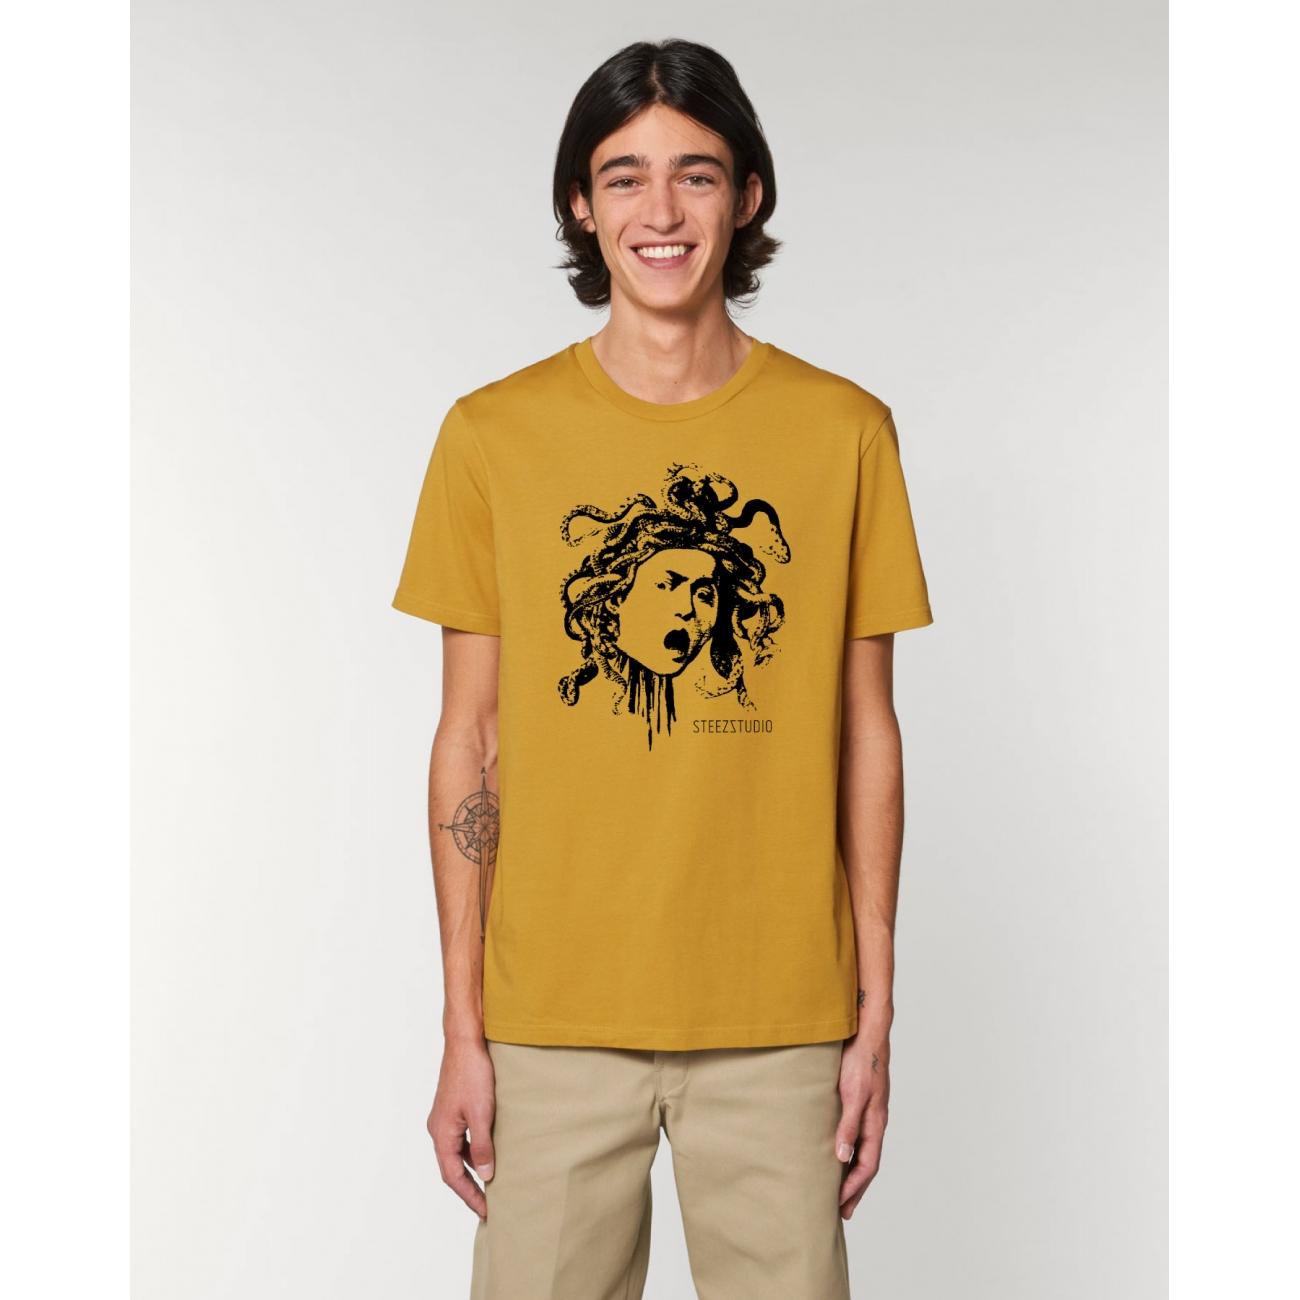 https://tee-shirt-bio.com/10326-thickbox_default/tee-shirt-homme-coton-bio-col-rond-coupe-classique-jaune-ocre-impression-meduse-caravage.jpg